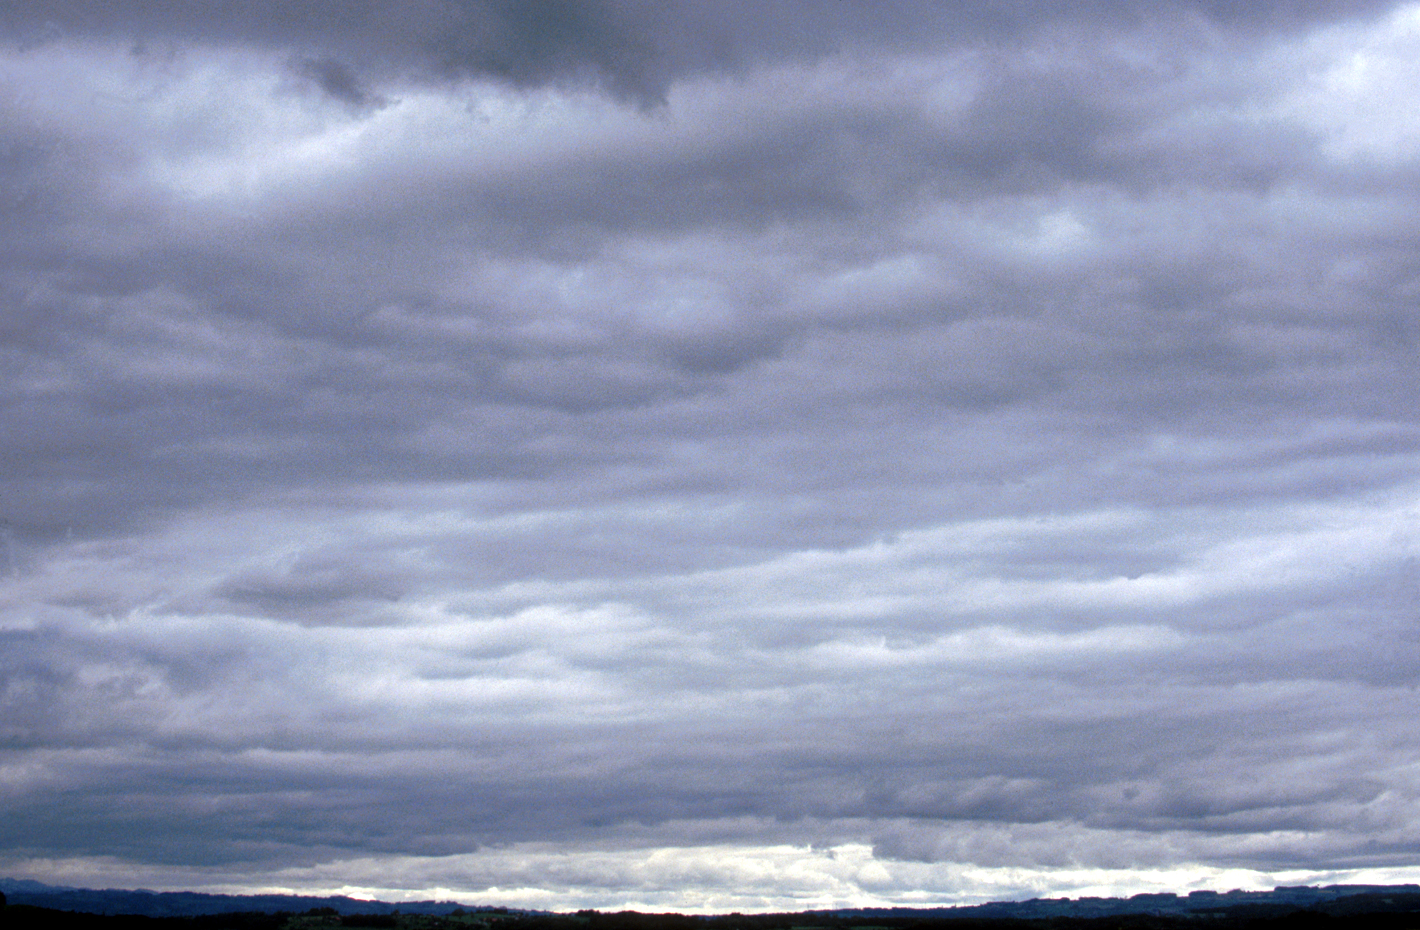 انواع ابرها کلاس سوم